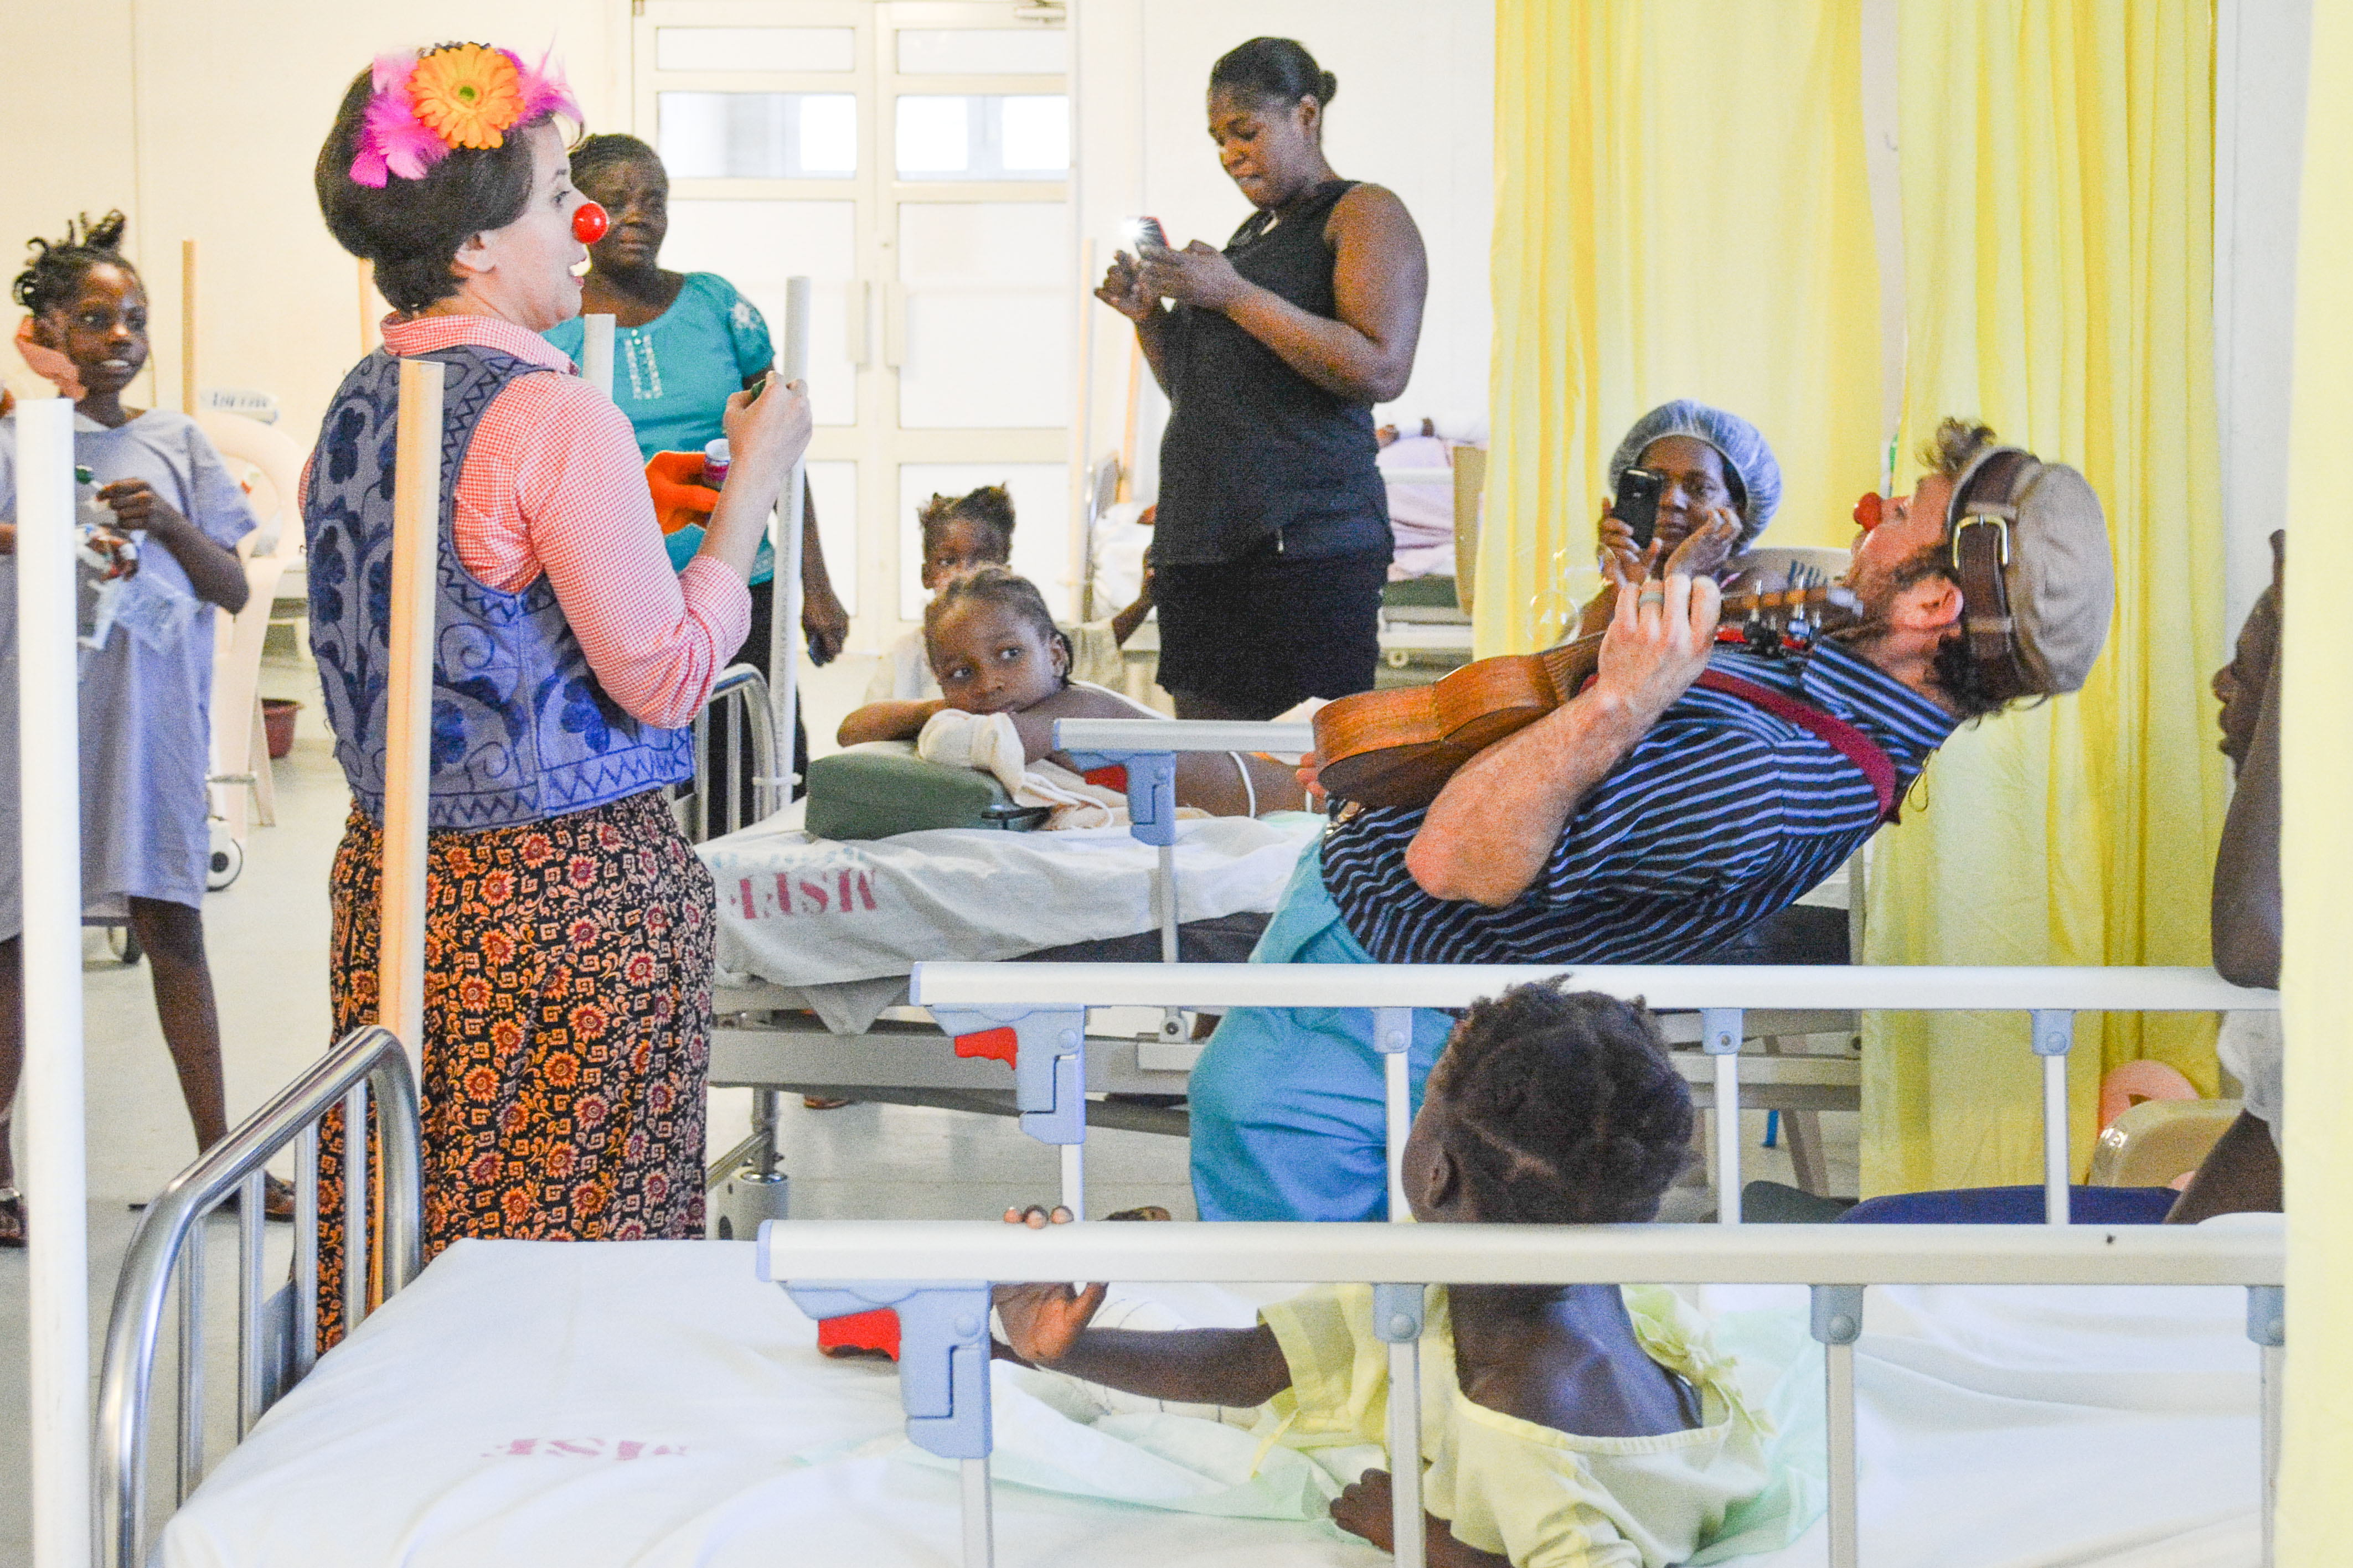 Clowns in the hospital in Haiti